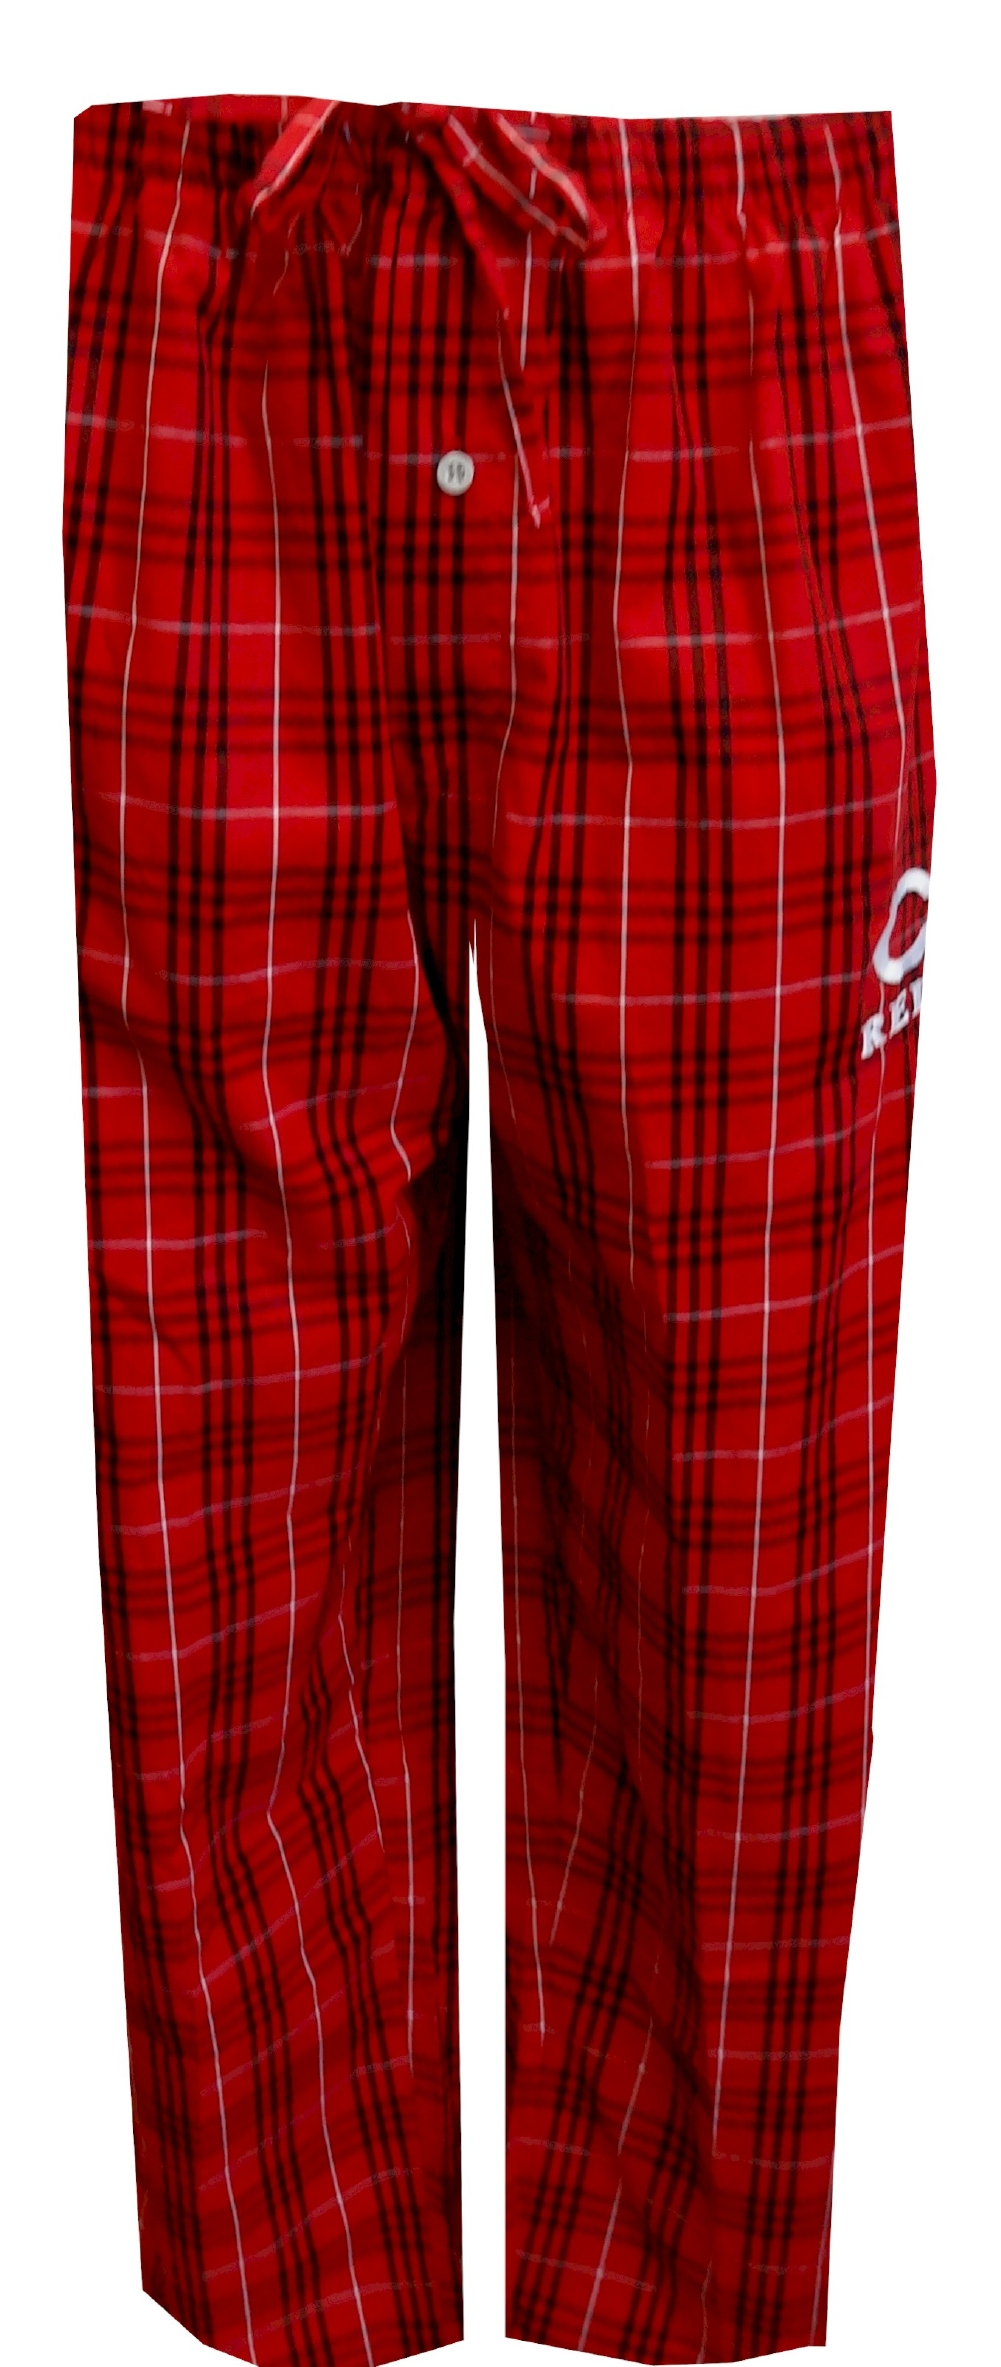 MLB Cincinnati Reds Logo Woven Plaid Lounge Pants for men